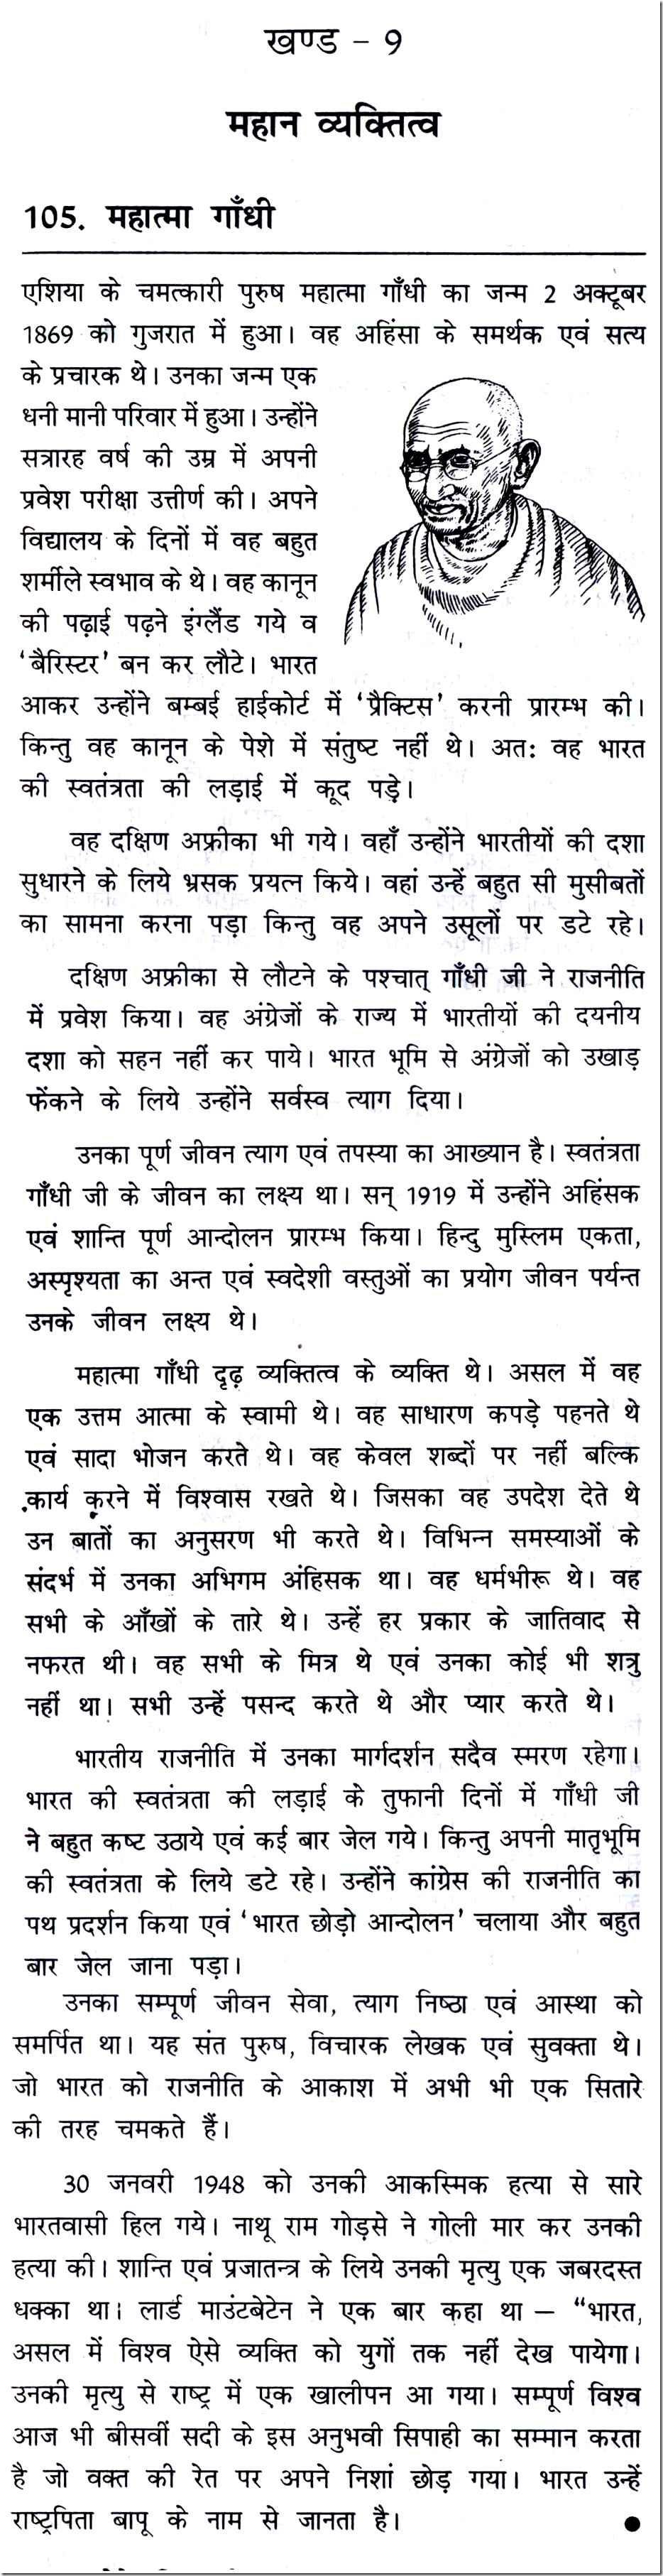 012 Mahatma Gandhi Essay 10107 Thumb Magnificent Conclusion In English 1000 Words Pdf Hindi 5 Lines Full